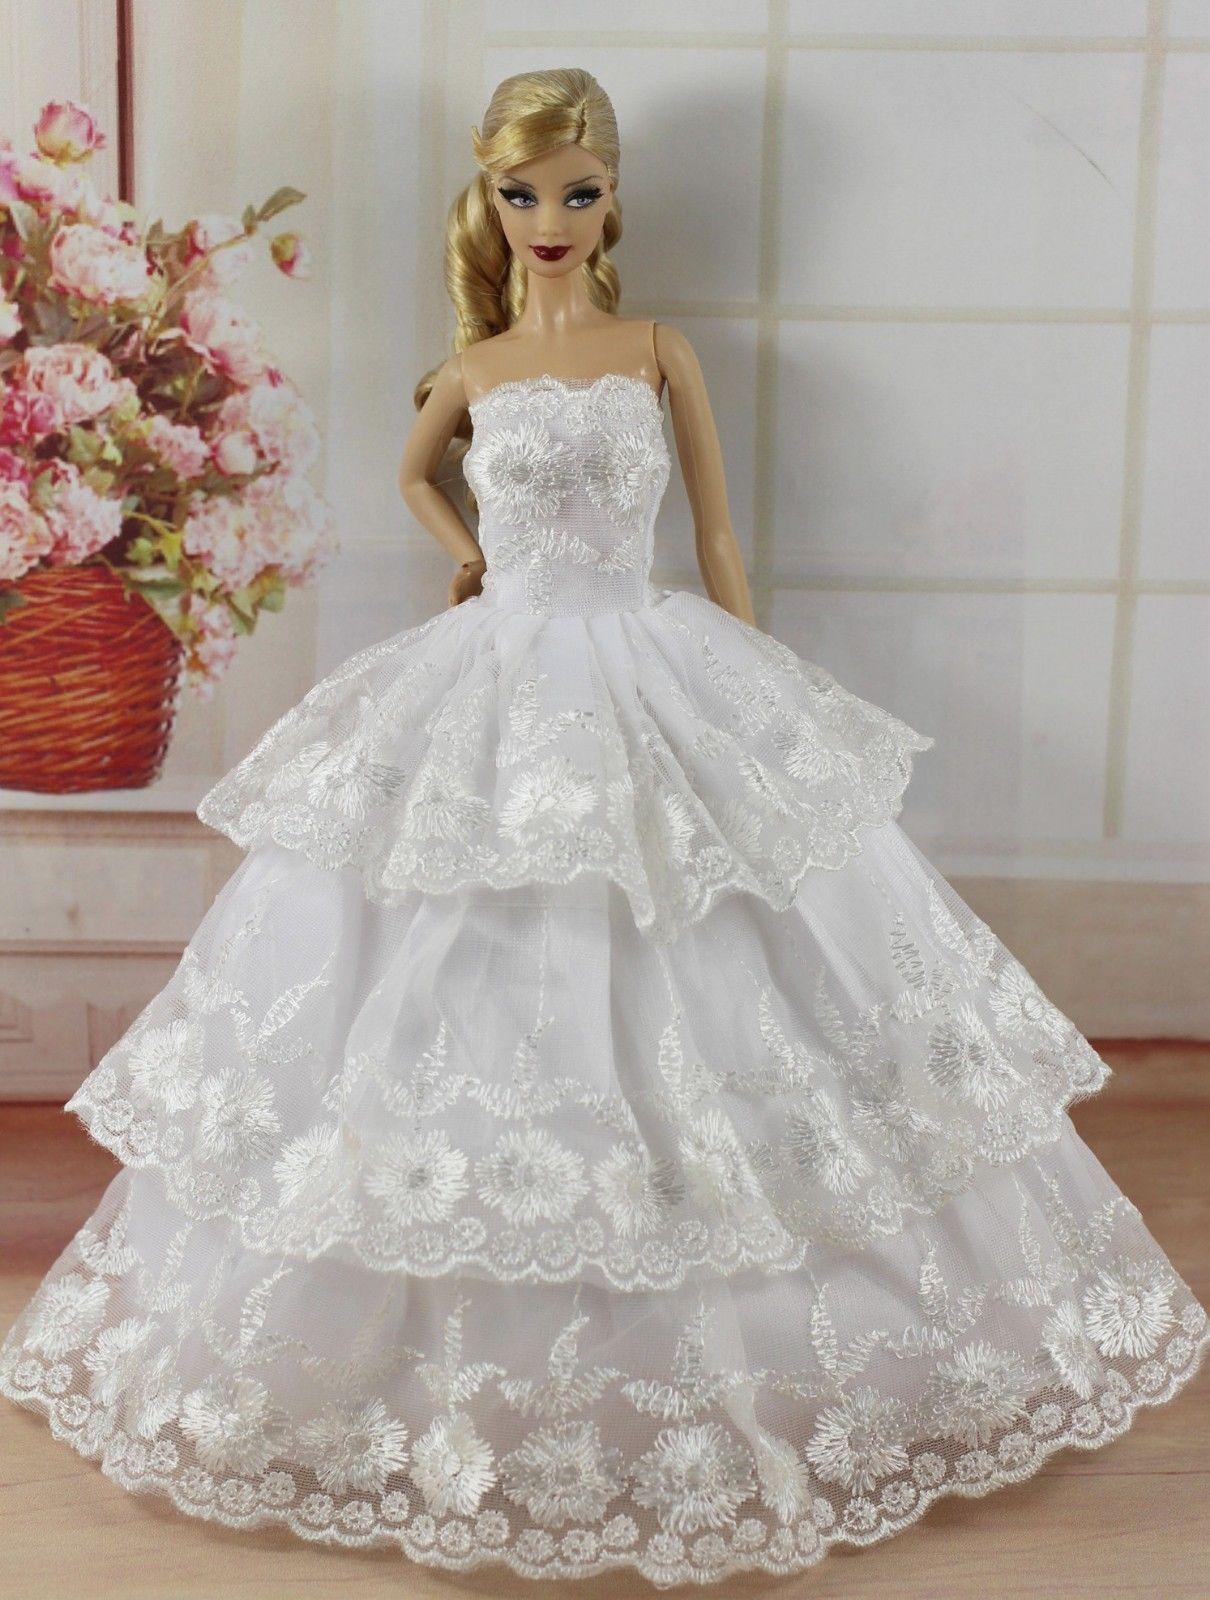 Doll wedding dress   PCS Fashion Princes DressWedding ClothesGown For Barbie Doll